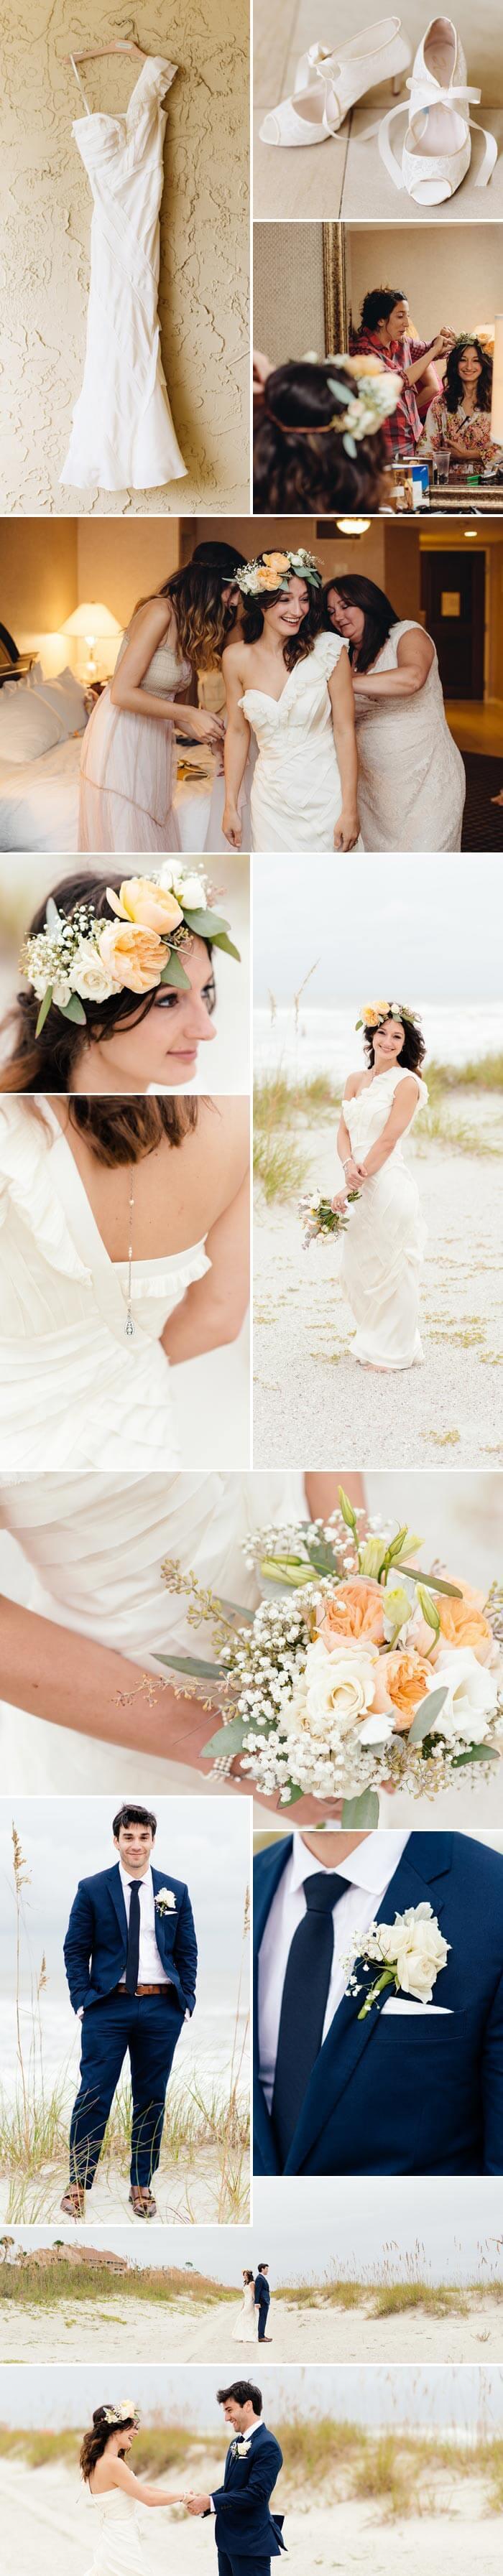 Hochzeitskleid Strand